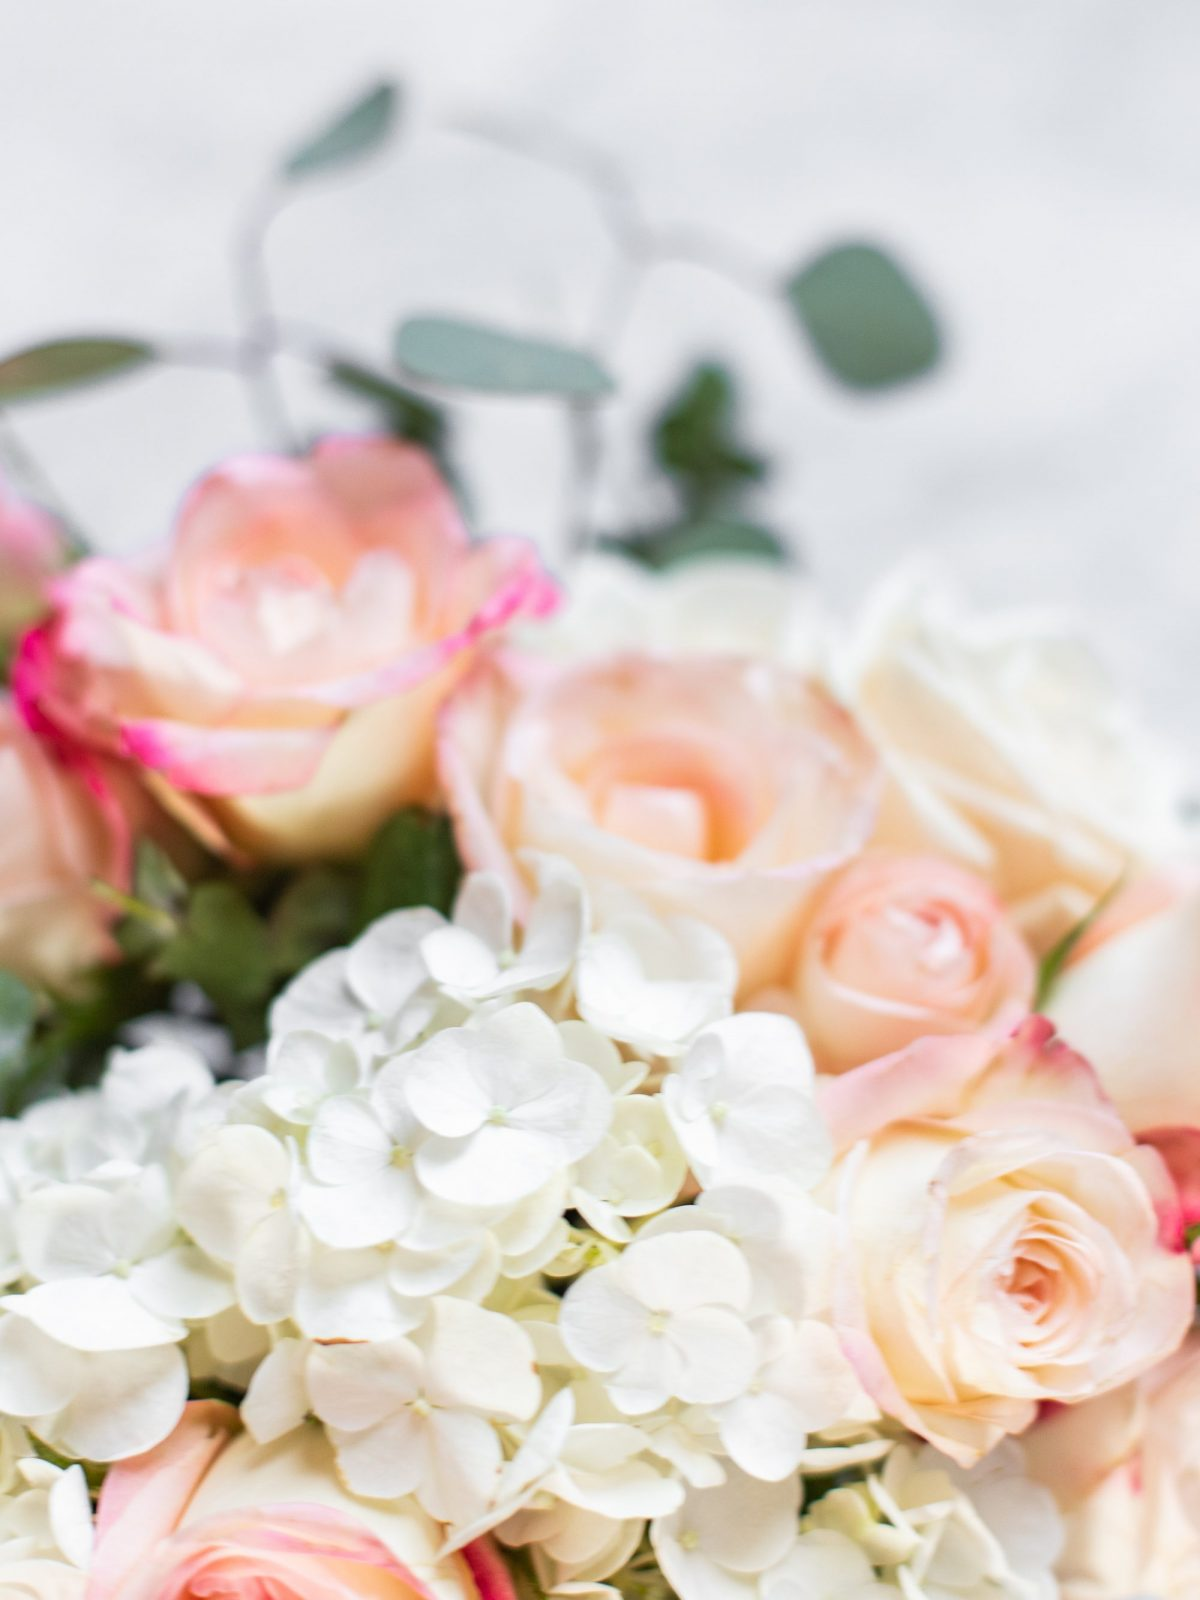 flower arranging 101, how to arrange flowers, flower arrangement tips, hosting tips, hostess ideas, hosting decor ideas